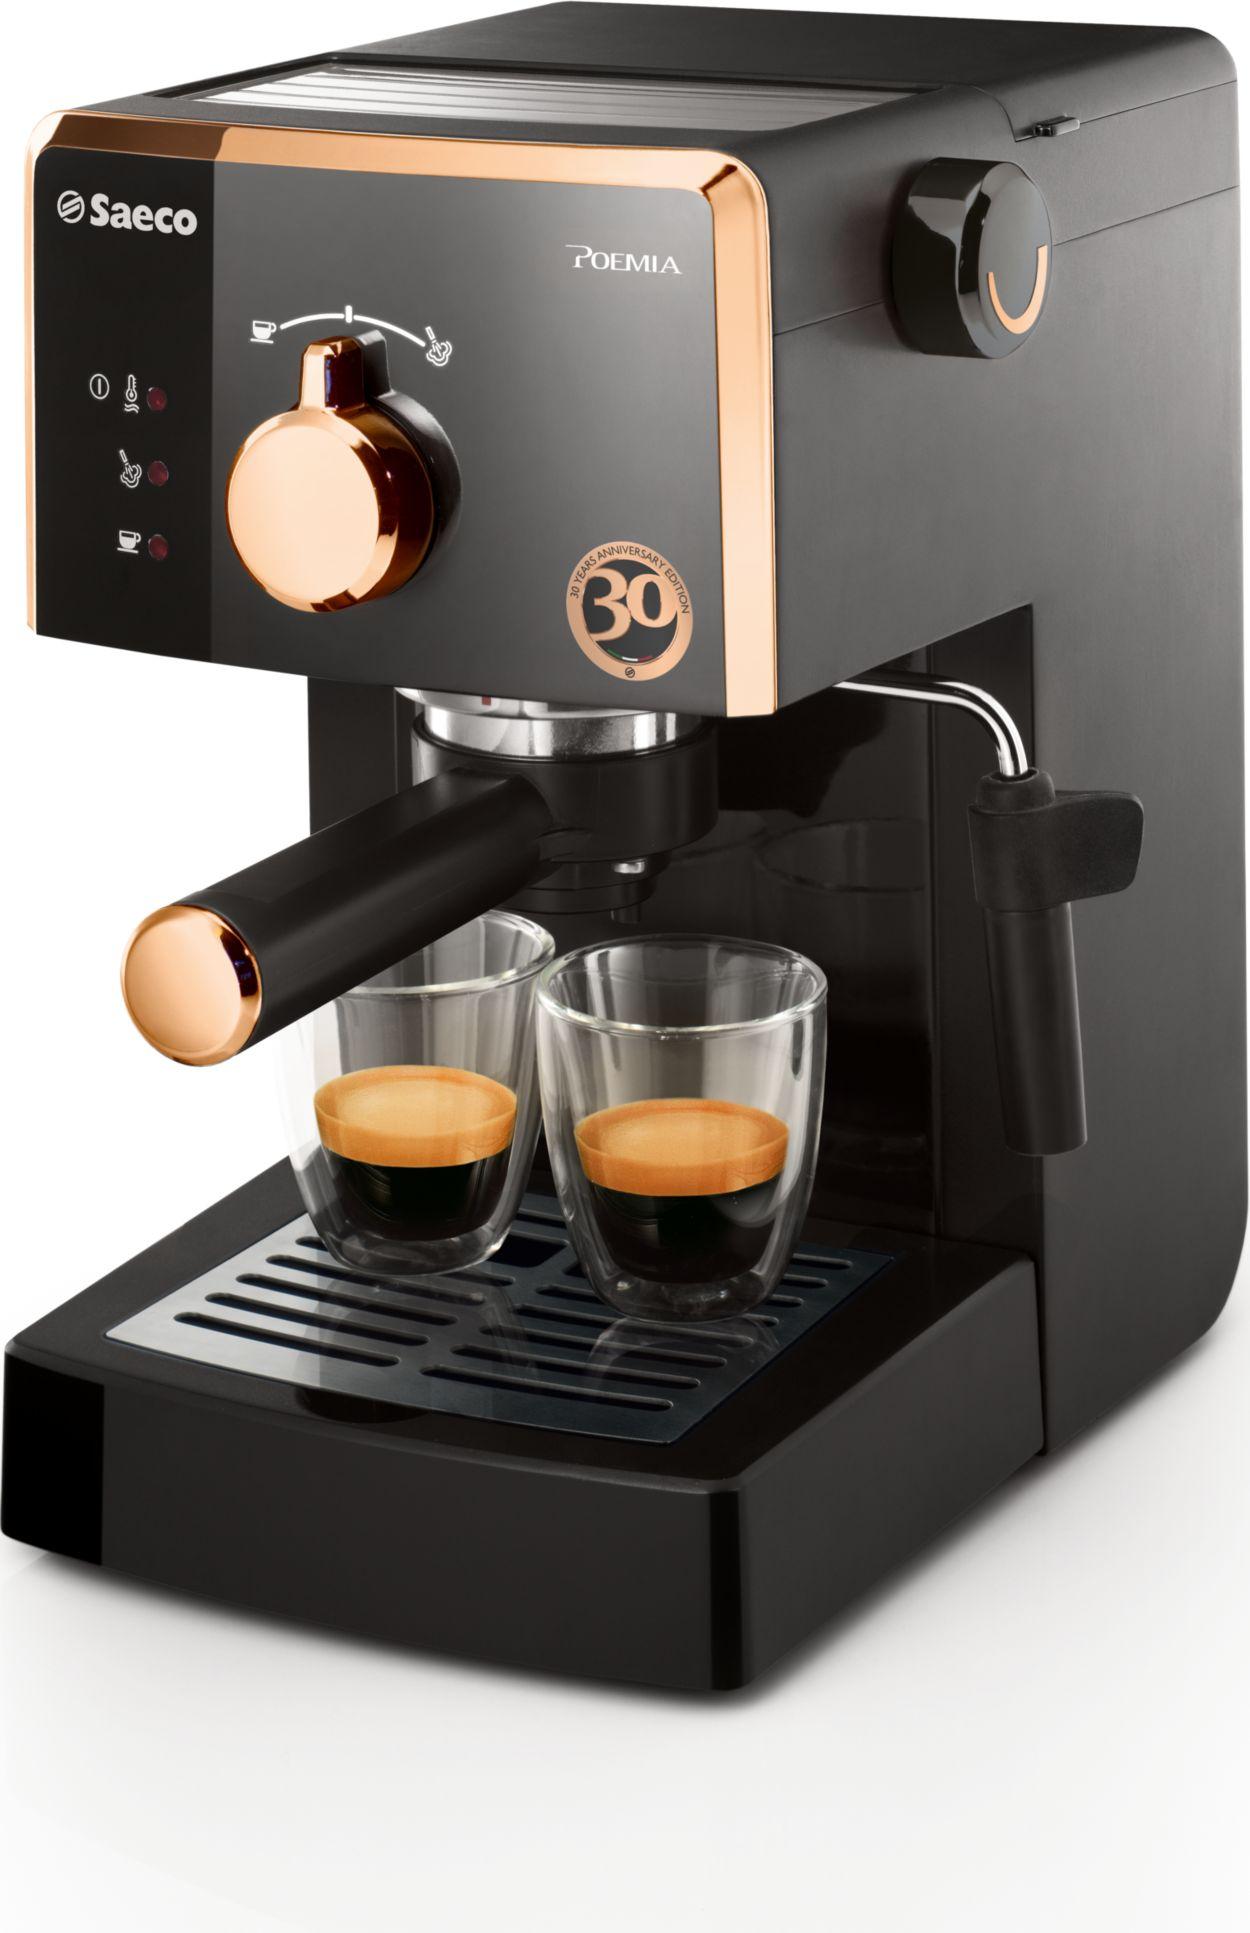 Electronic Saeco Coffee Machine Manual poemia manual espresso machine hd832325 saeco authentic italian every day